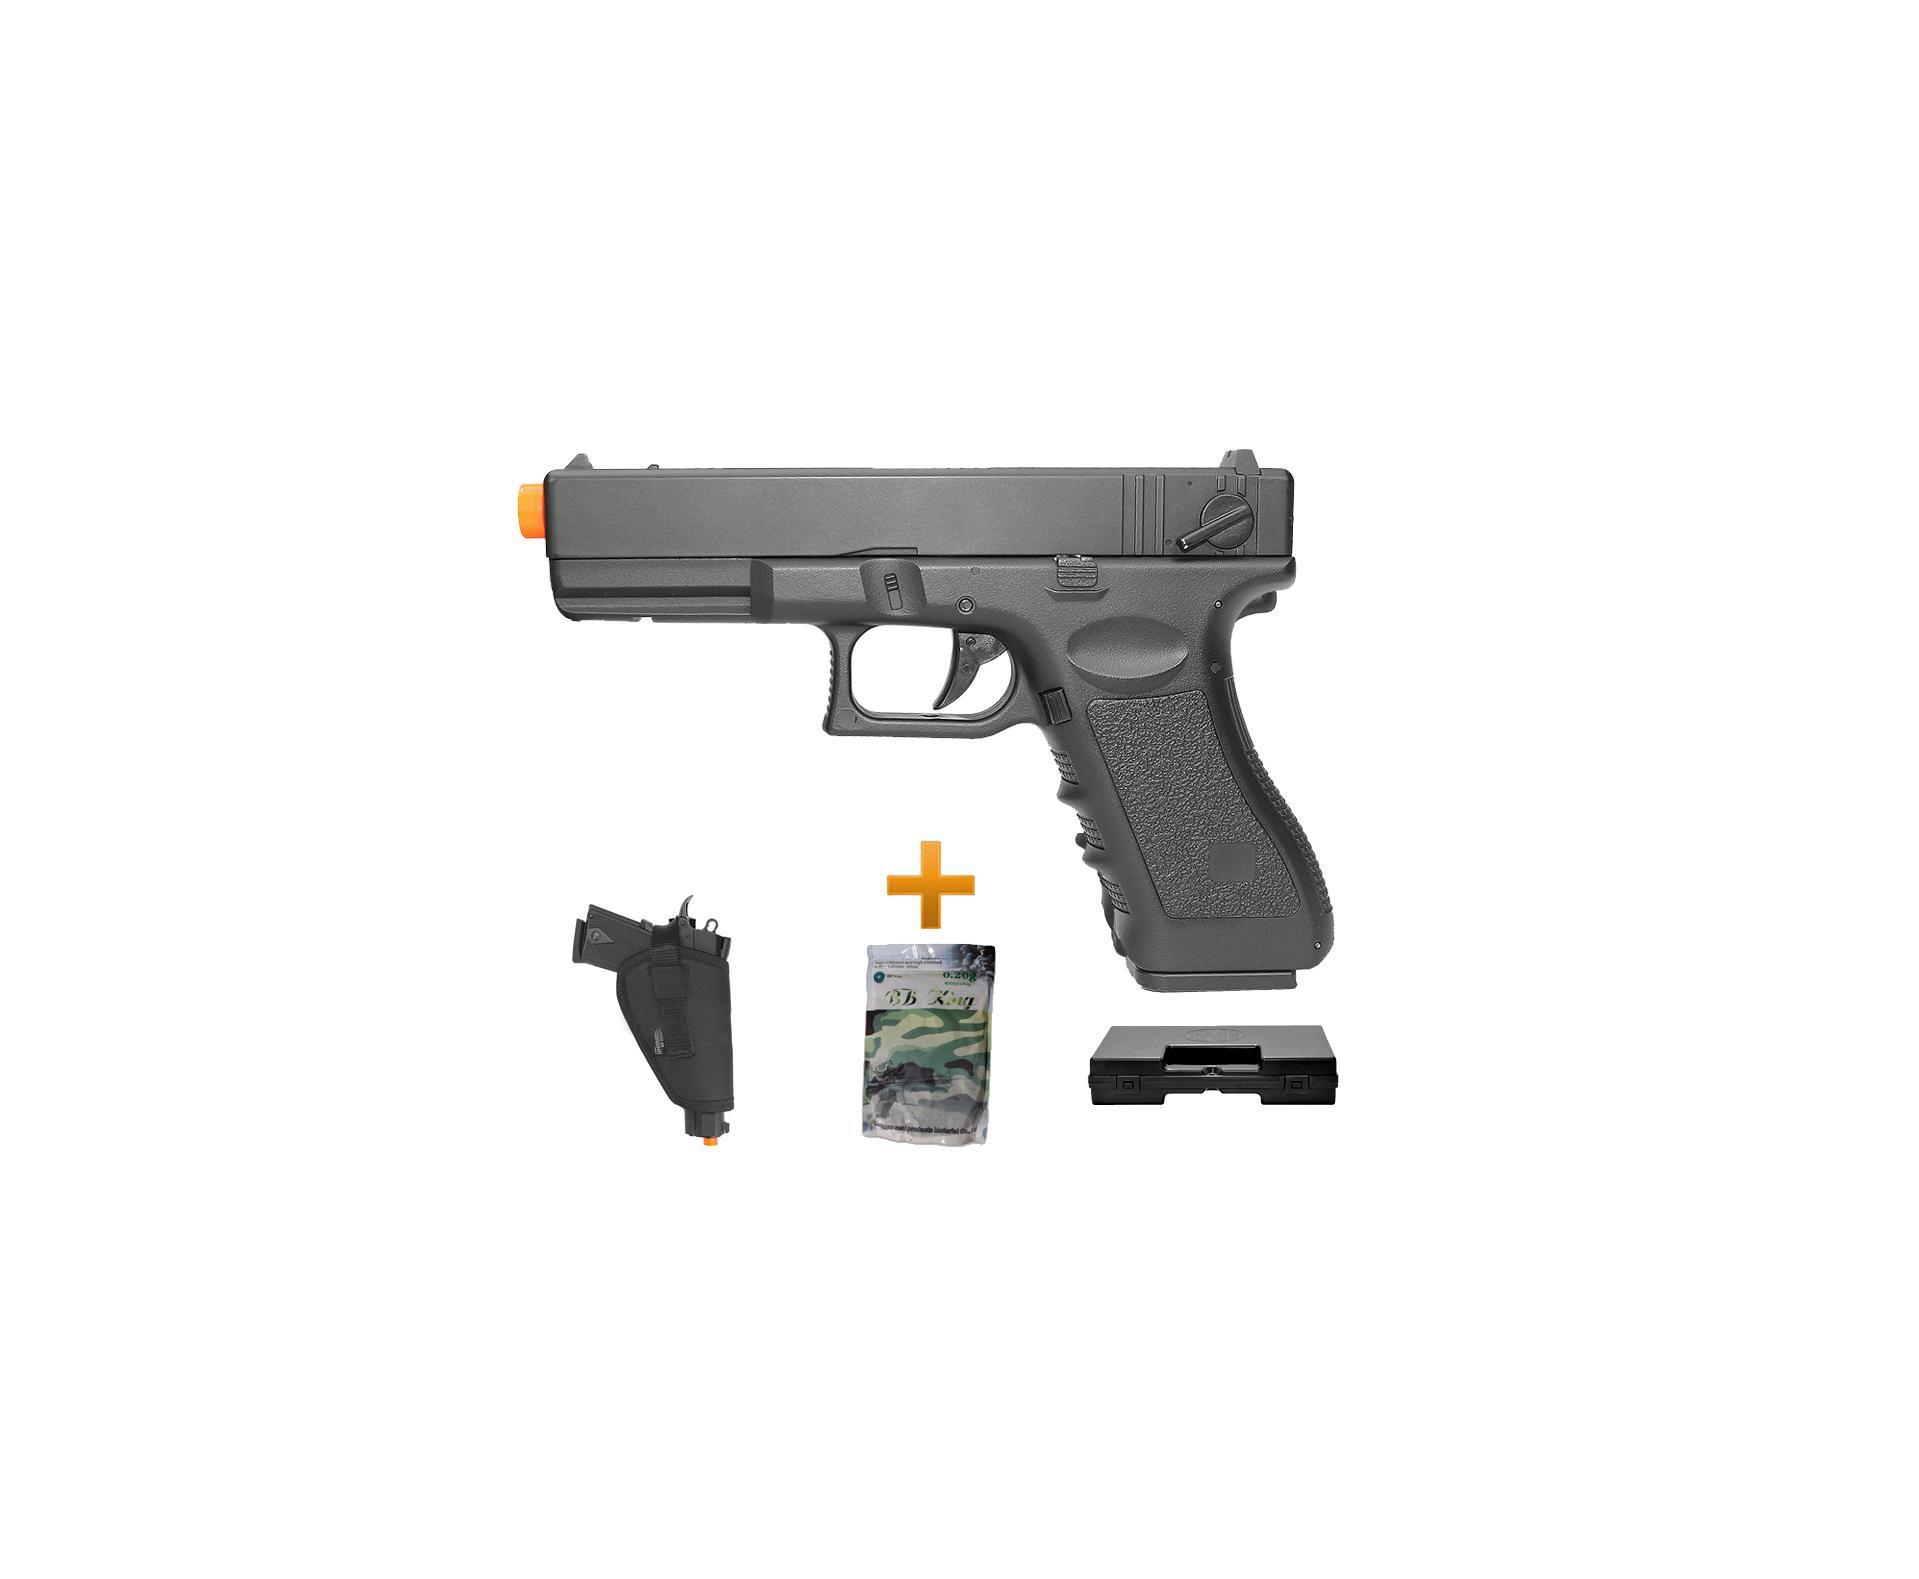 Pistola De Airsoft Glock G18c Bivolt + Esferas 0,20g + Case Deluxe + Coldre - Cyma